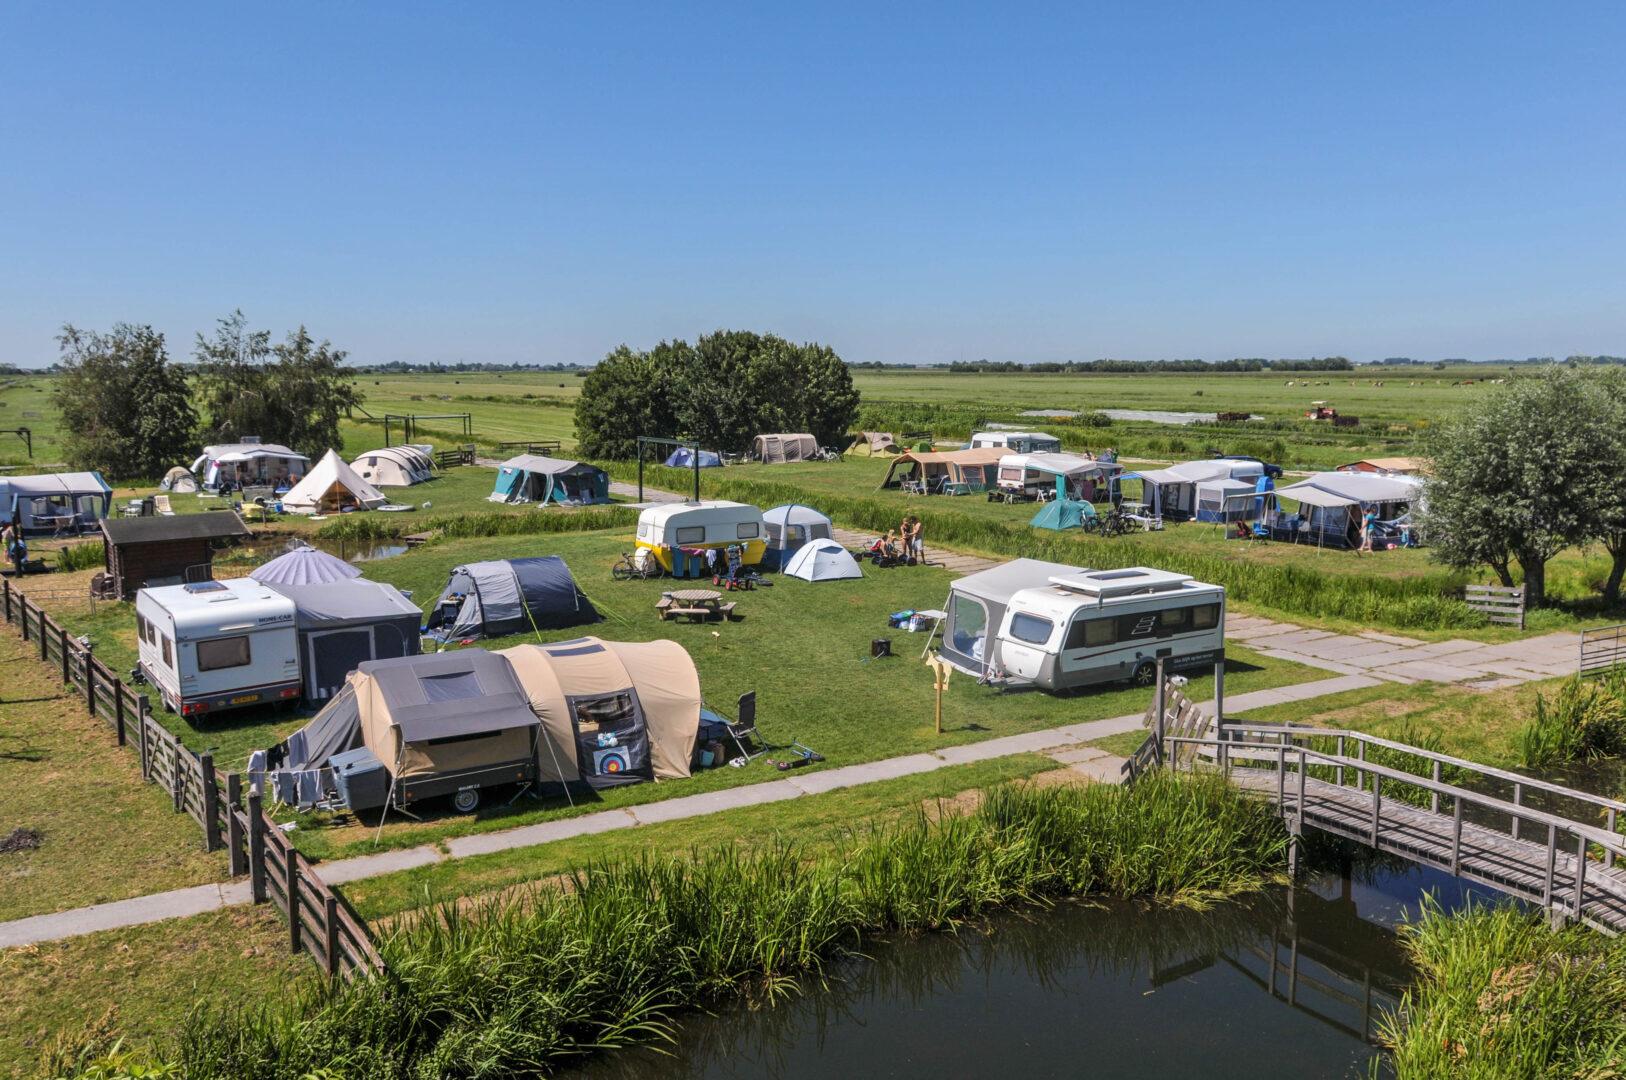 Omgeving   Camping de Boerinn